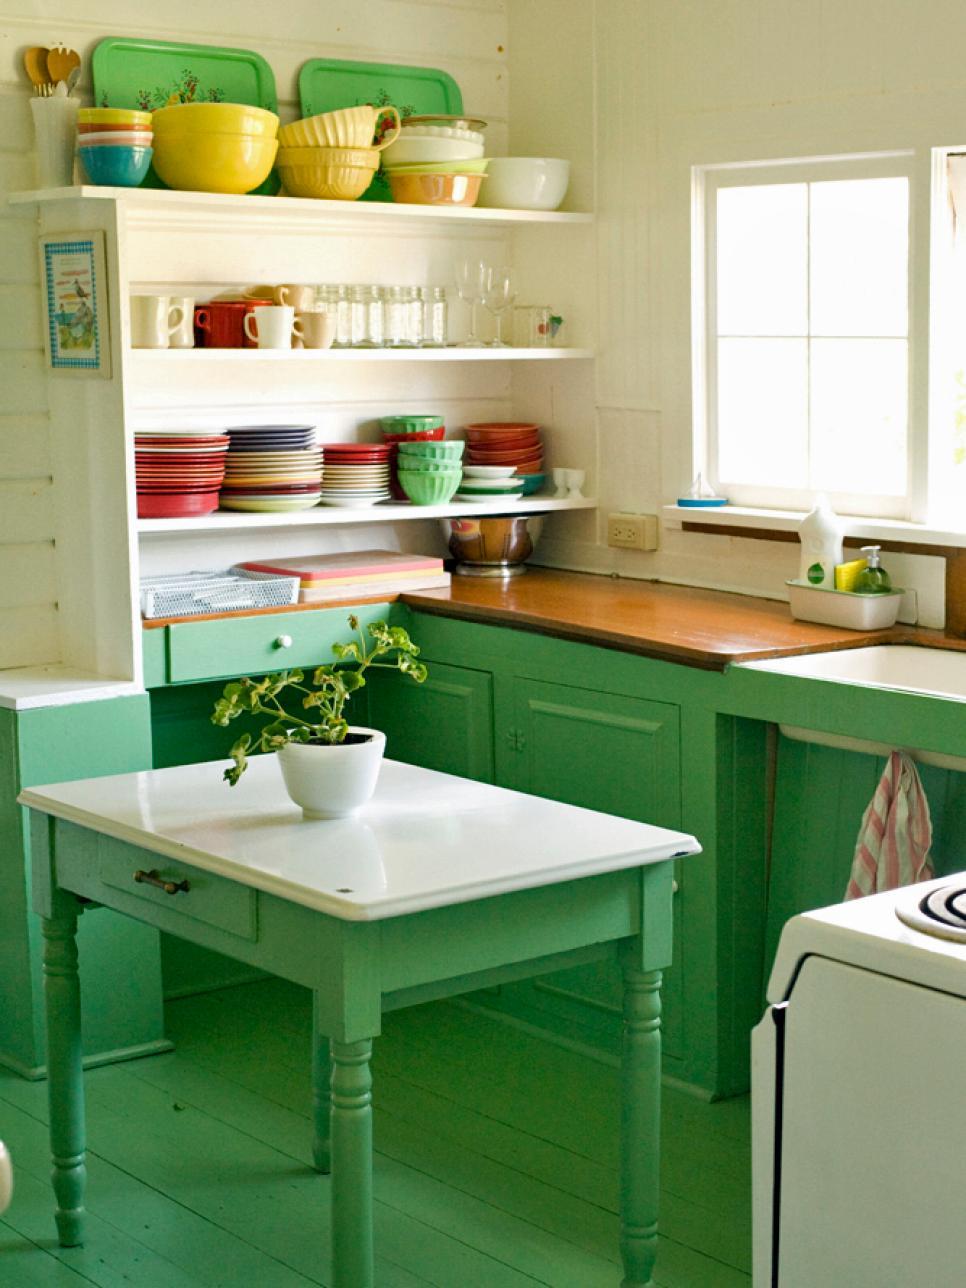 Decor Inspiration Colorful Kitchens That Work: Colorful Coastal Design